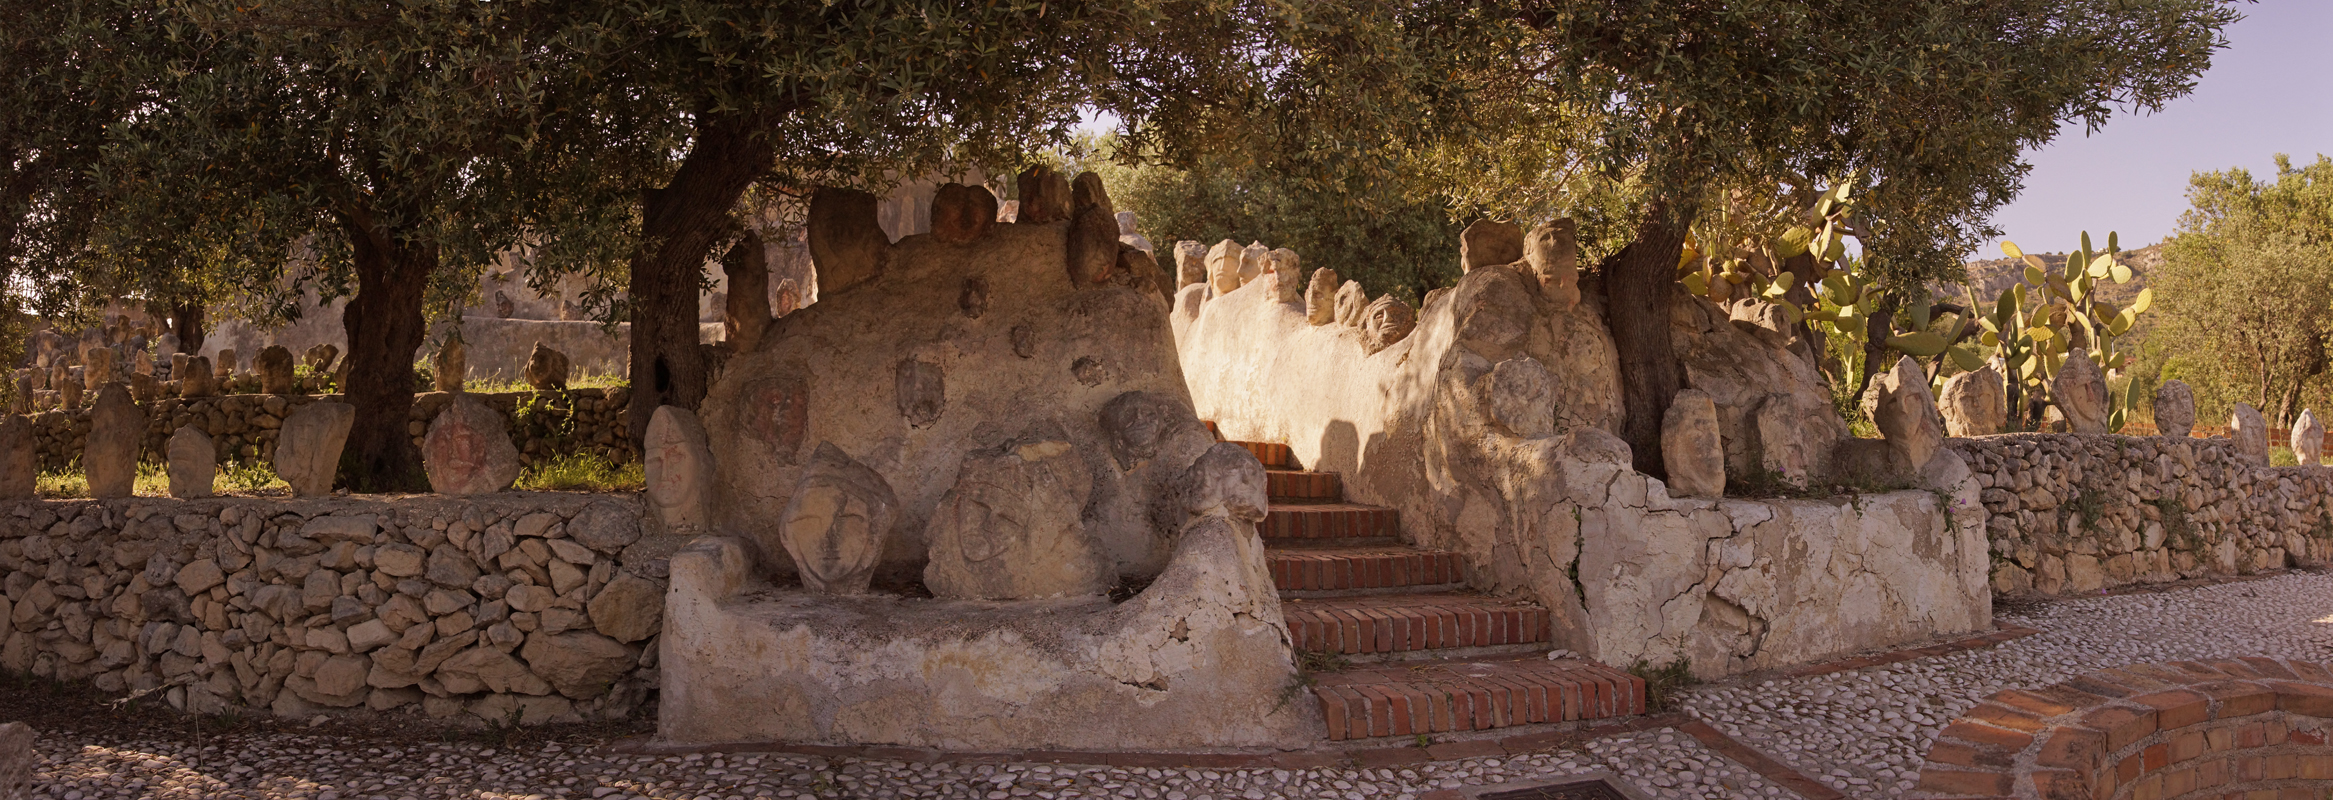 Vrt 'seoskog luđaka', Sicilija Sciaccafascia9b-sm